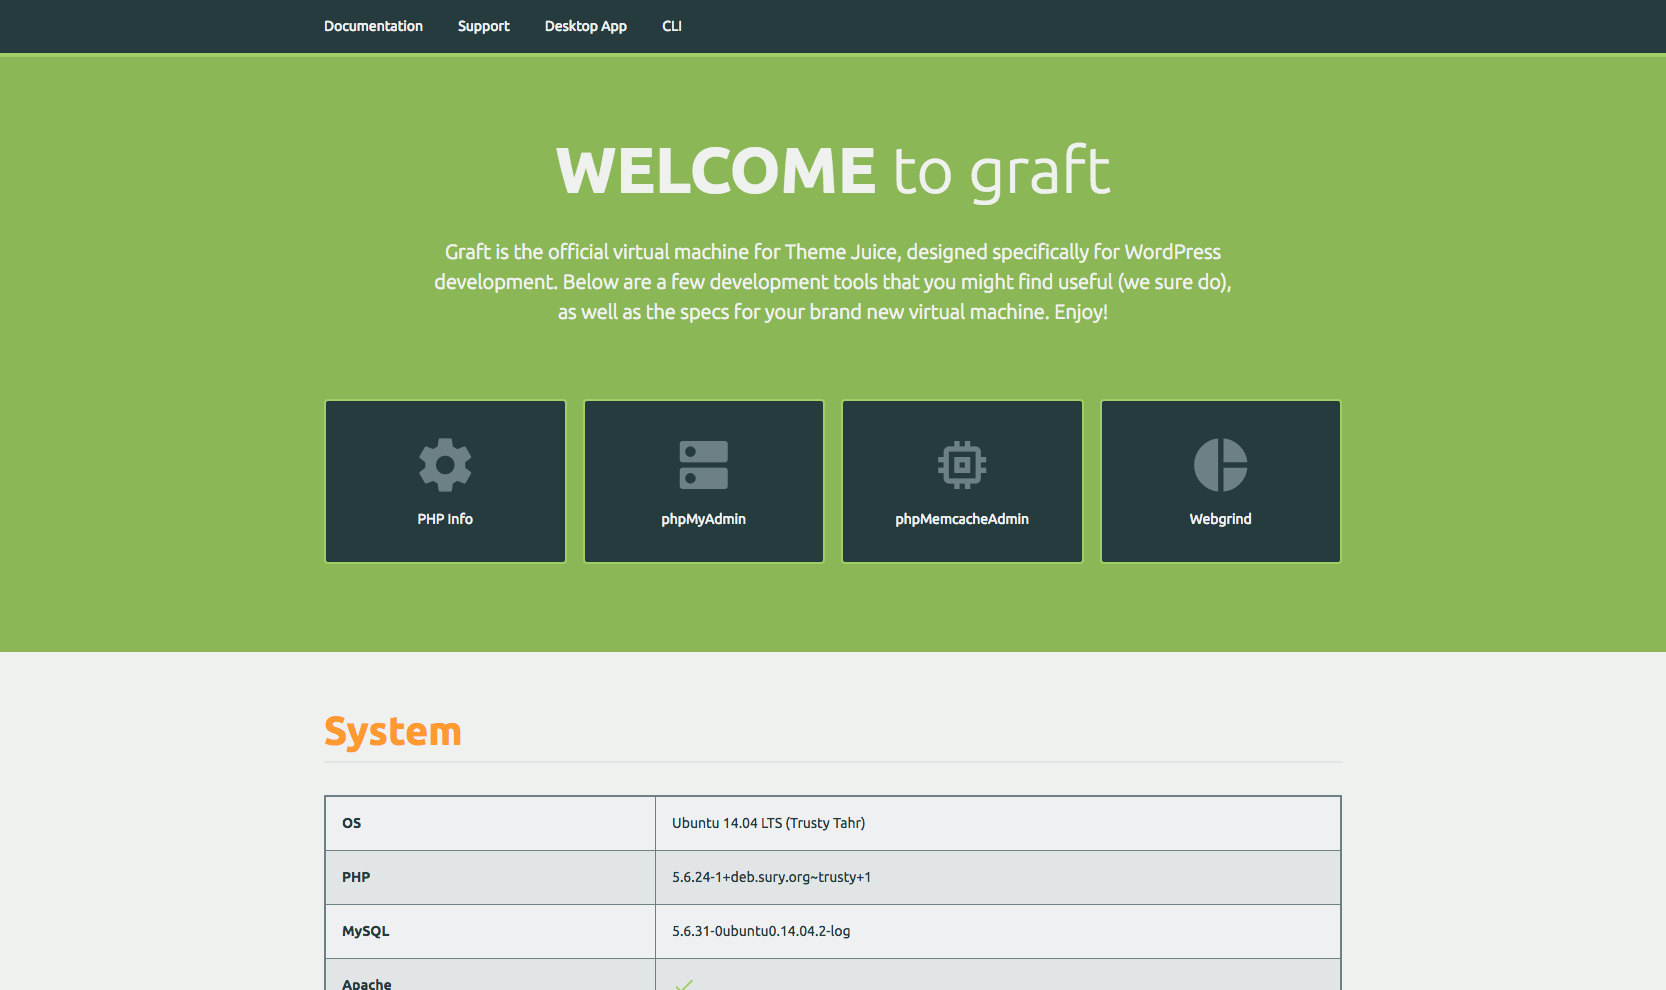 Graft VM dashboard screenshot